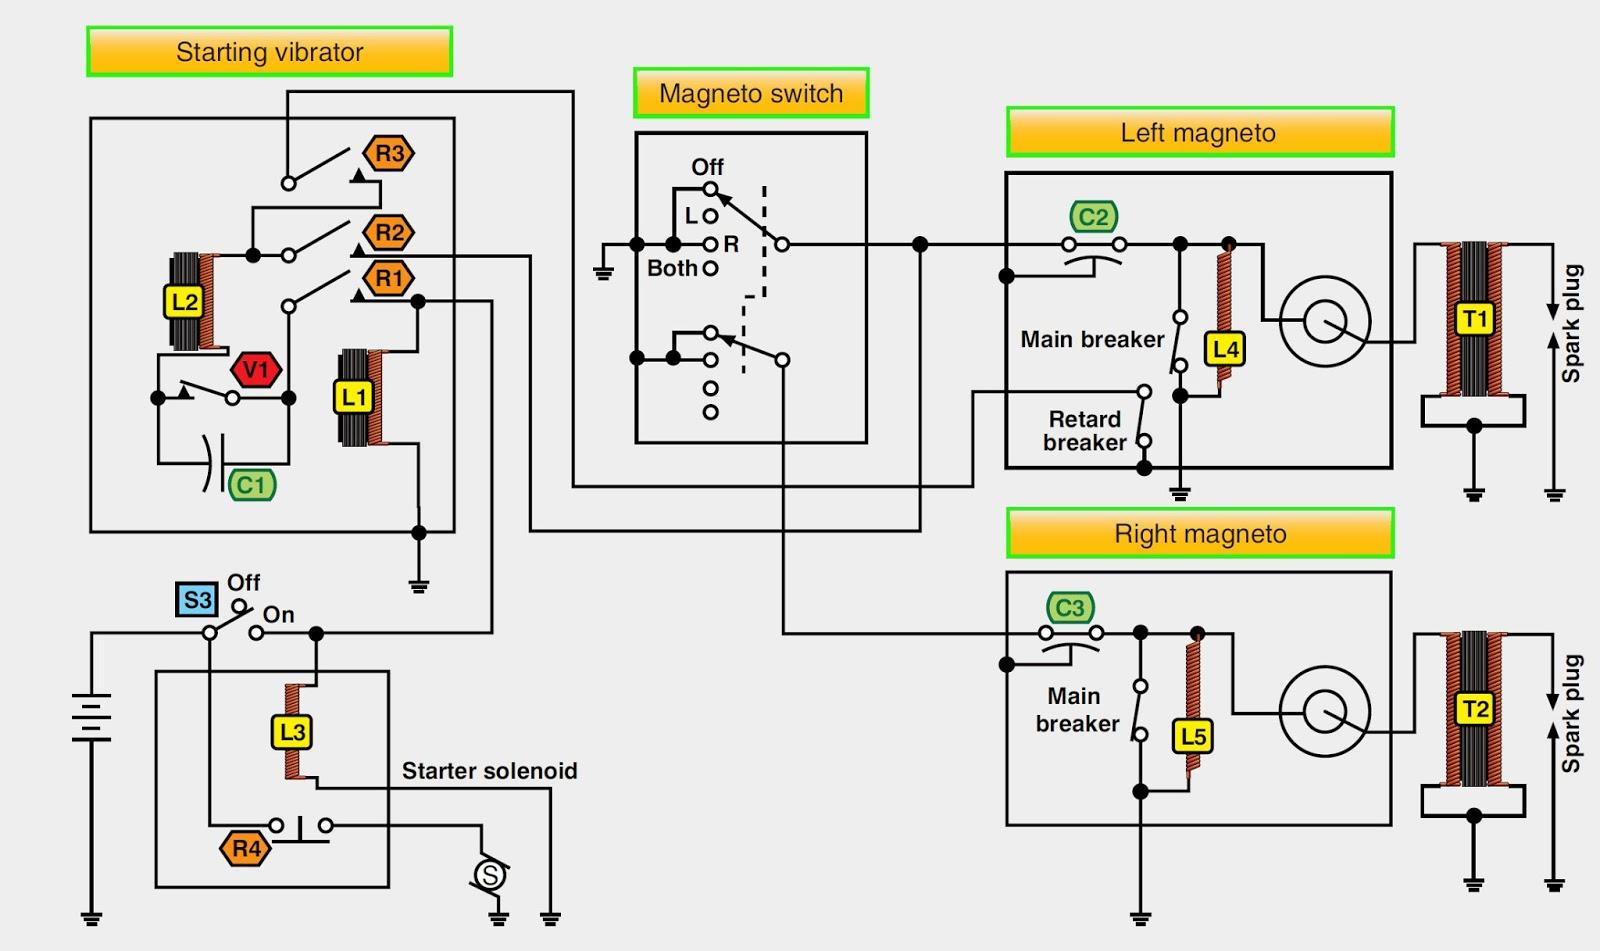 low tension retard breaker magneto and starting vibrator circuit [ 1600 x 951 Pixel ]